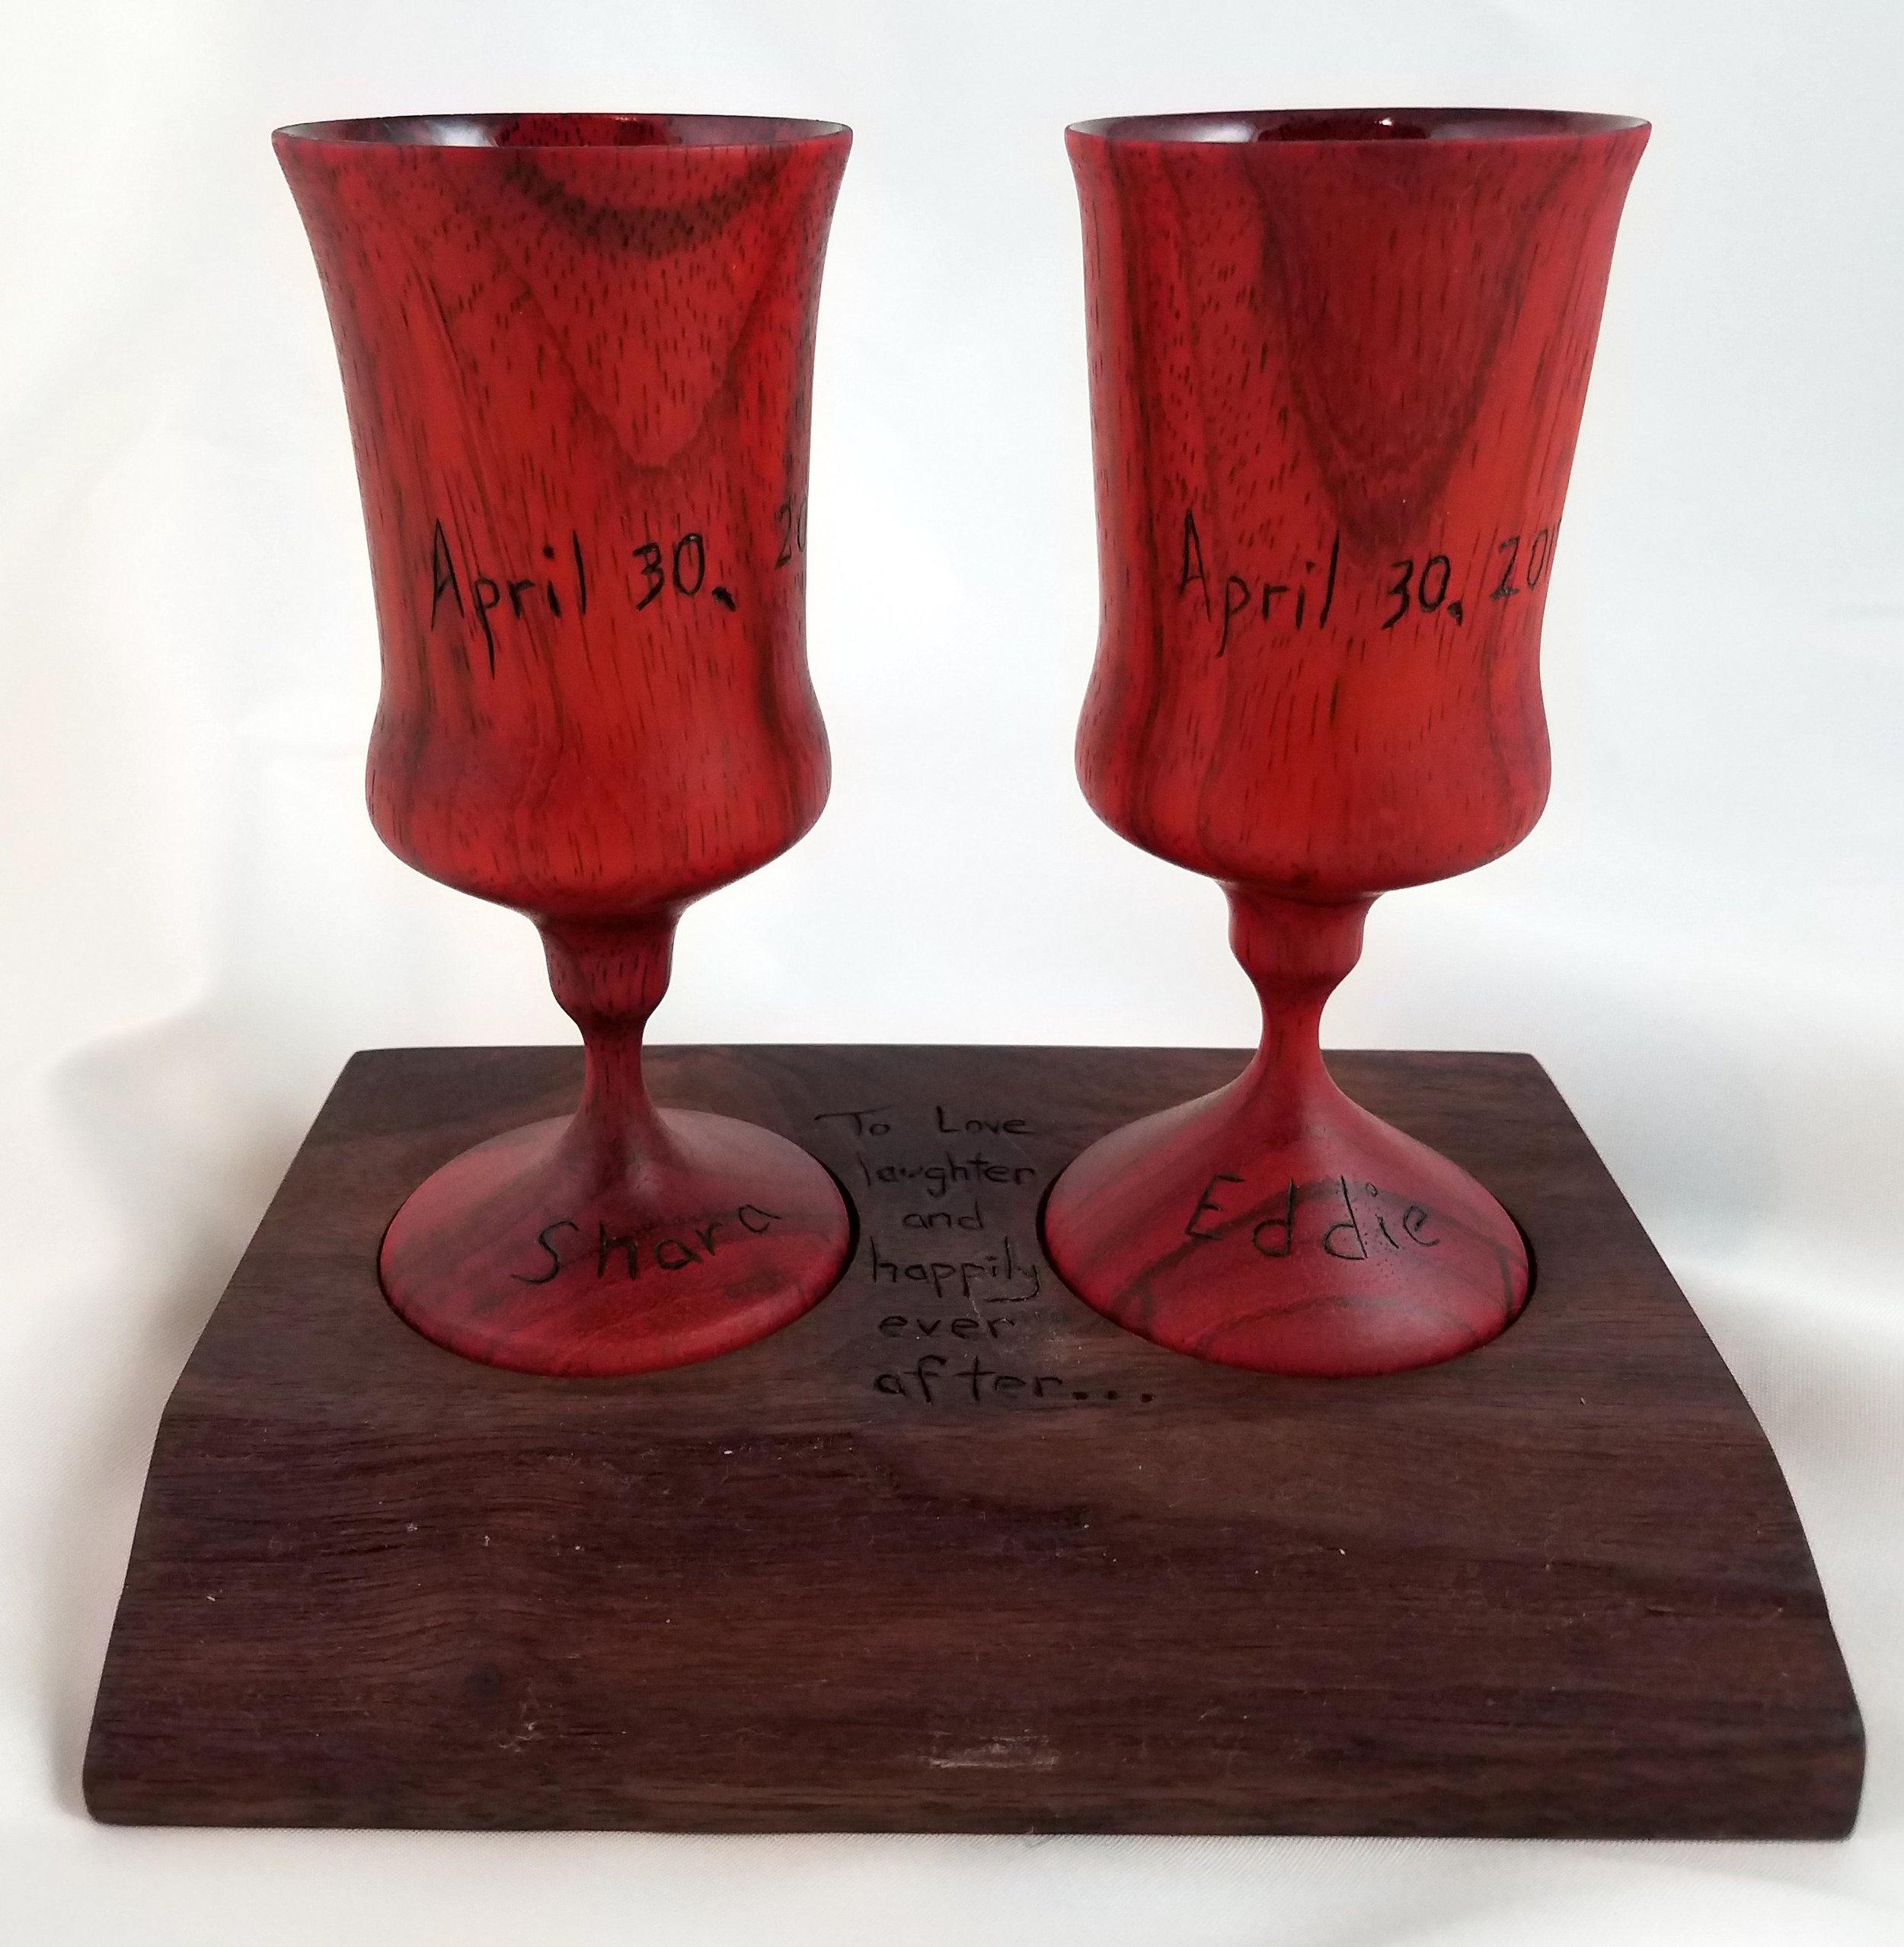 Padauk cordial glasses on Walnut base with wood burnt inscription.